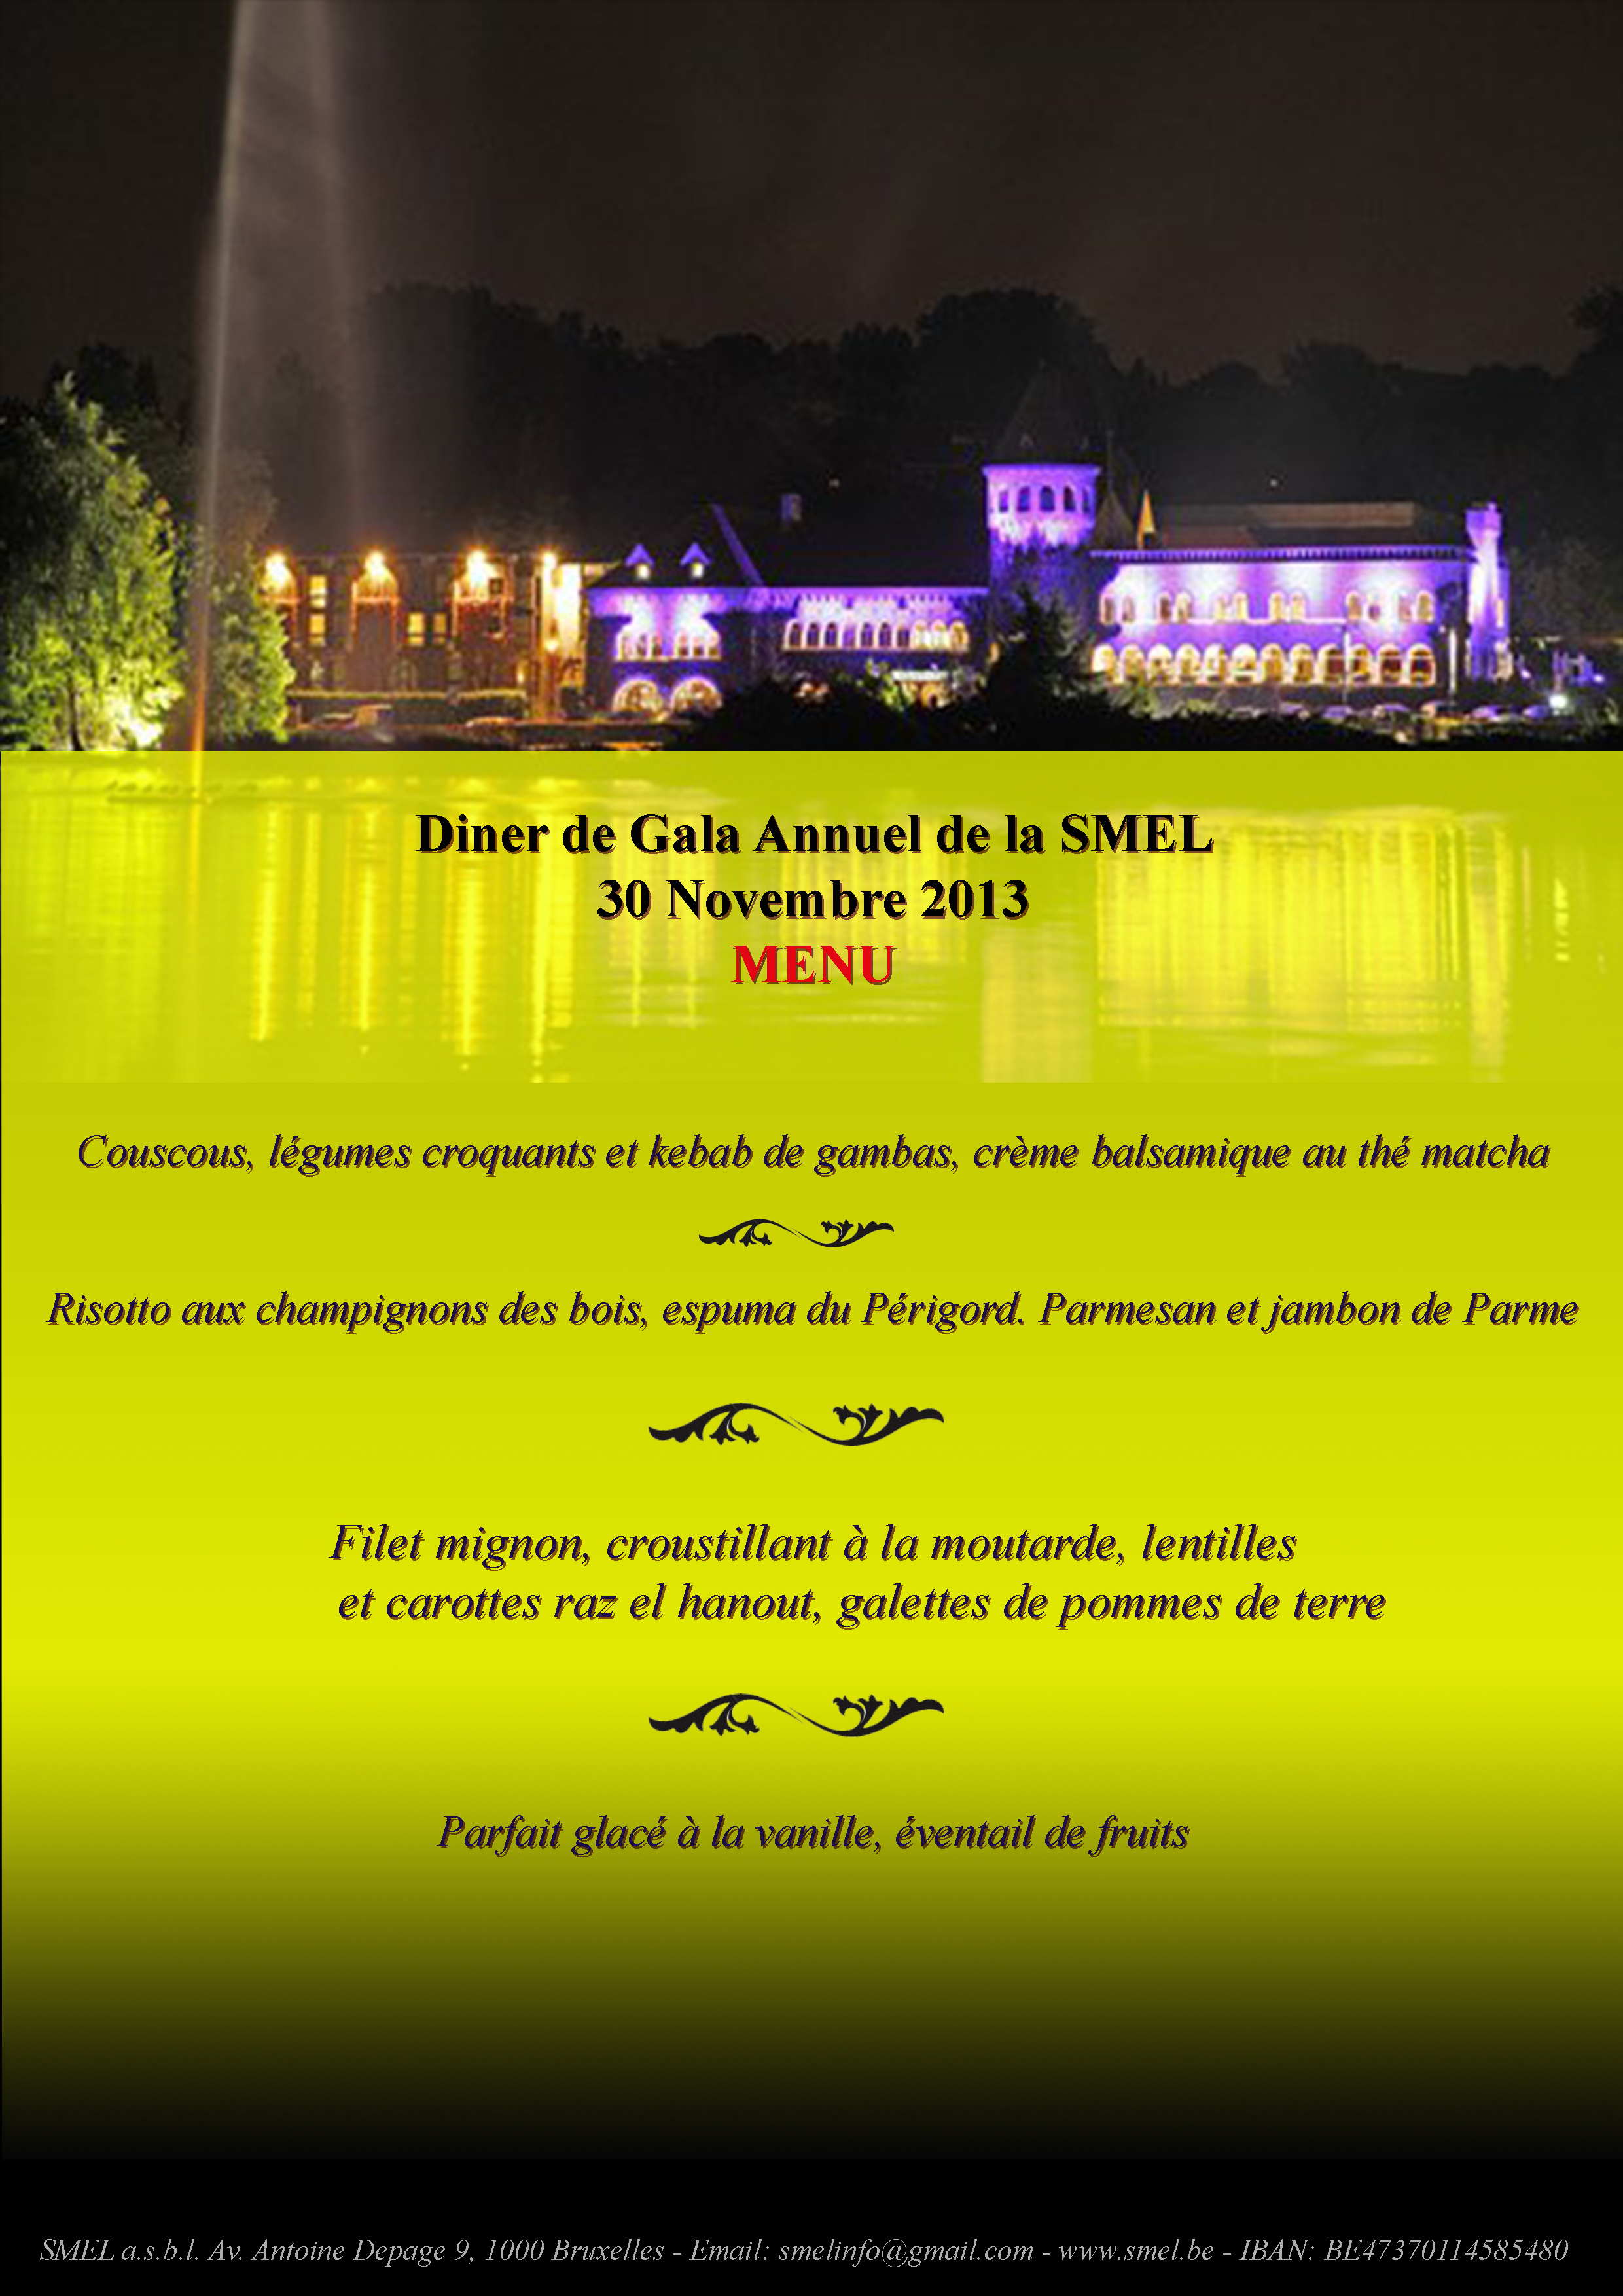 Affiche Gala SMEL 2013 - Menu